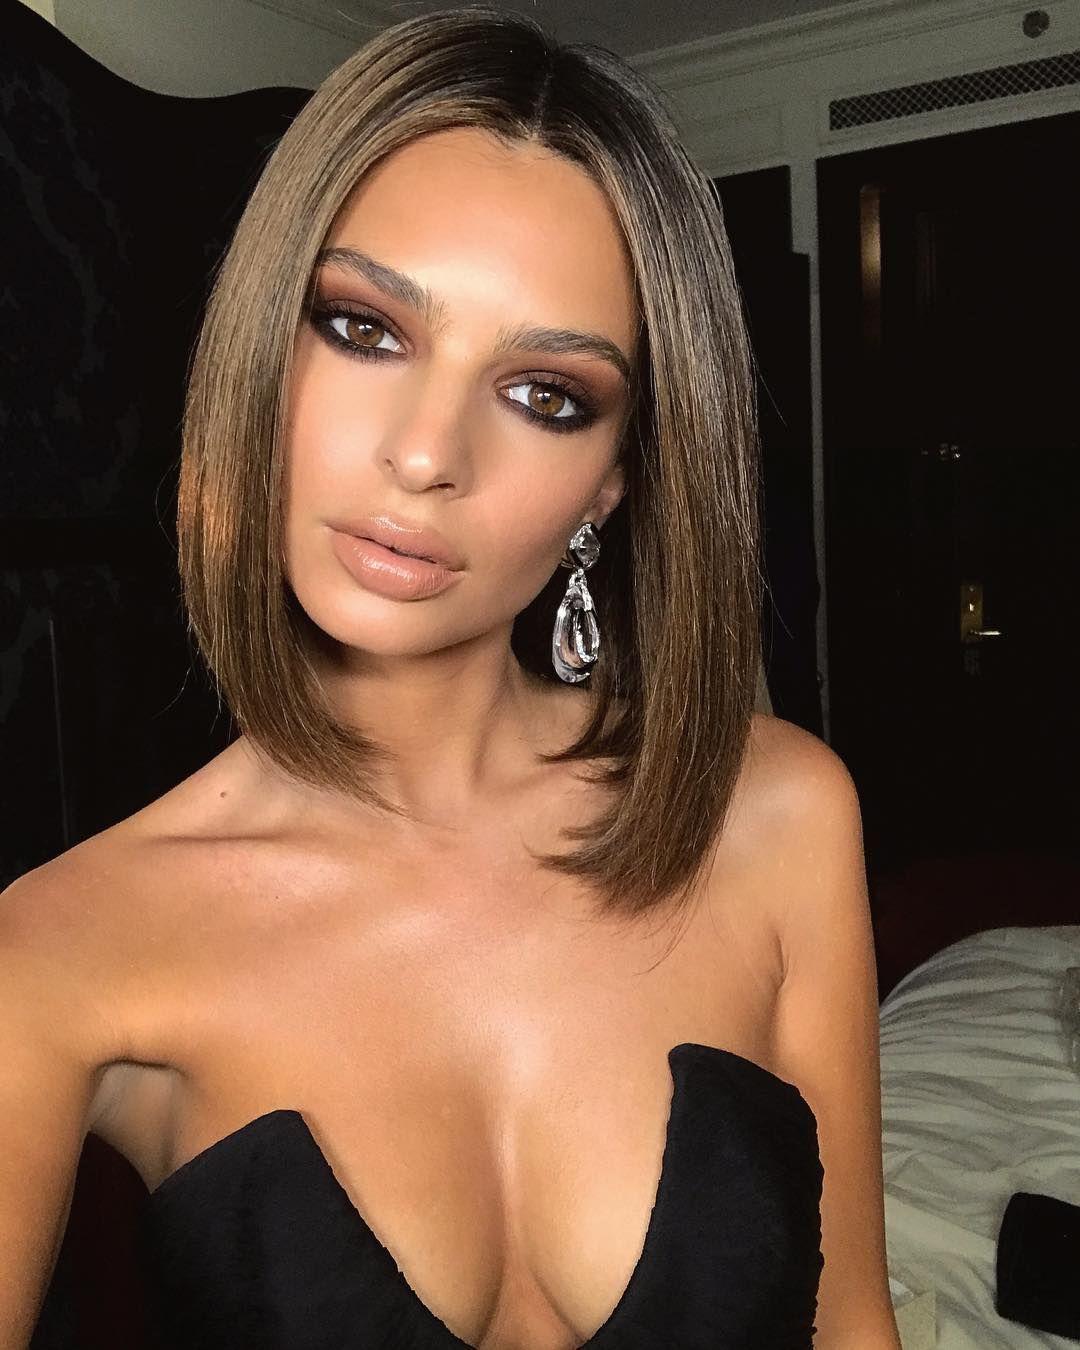 Brown eye girl anal sex